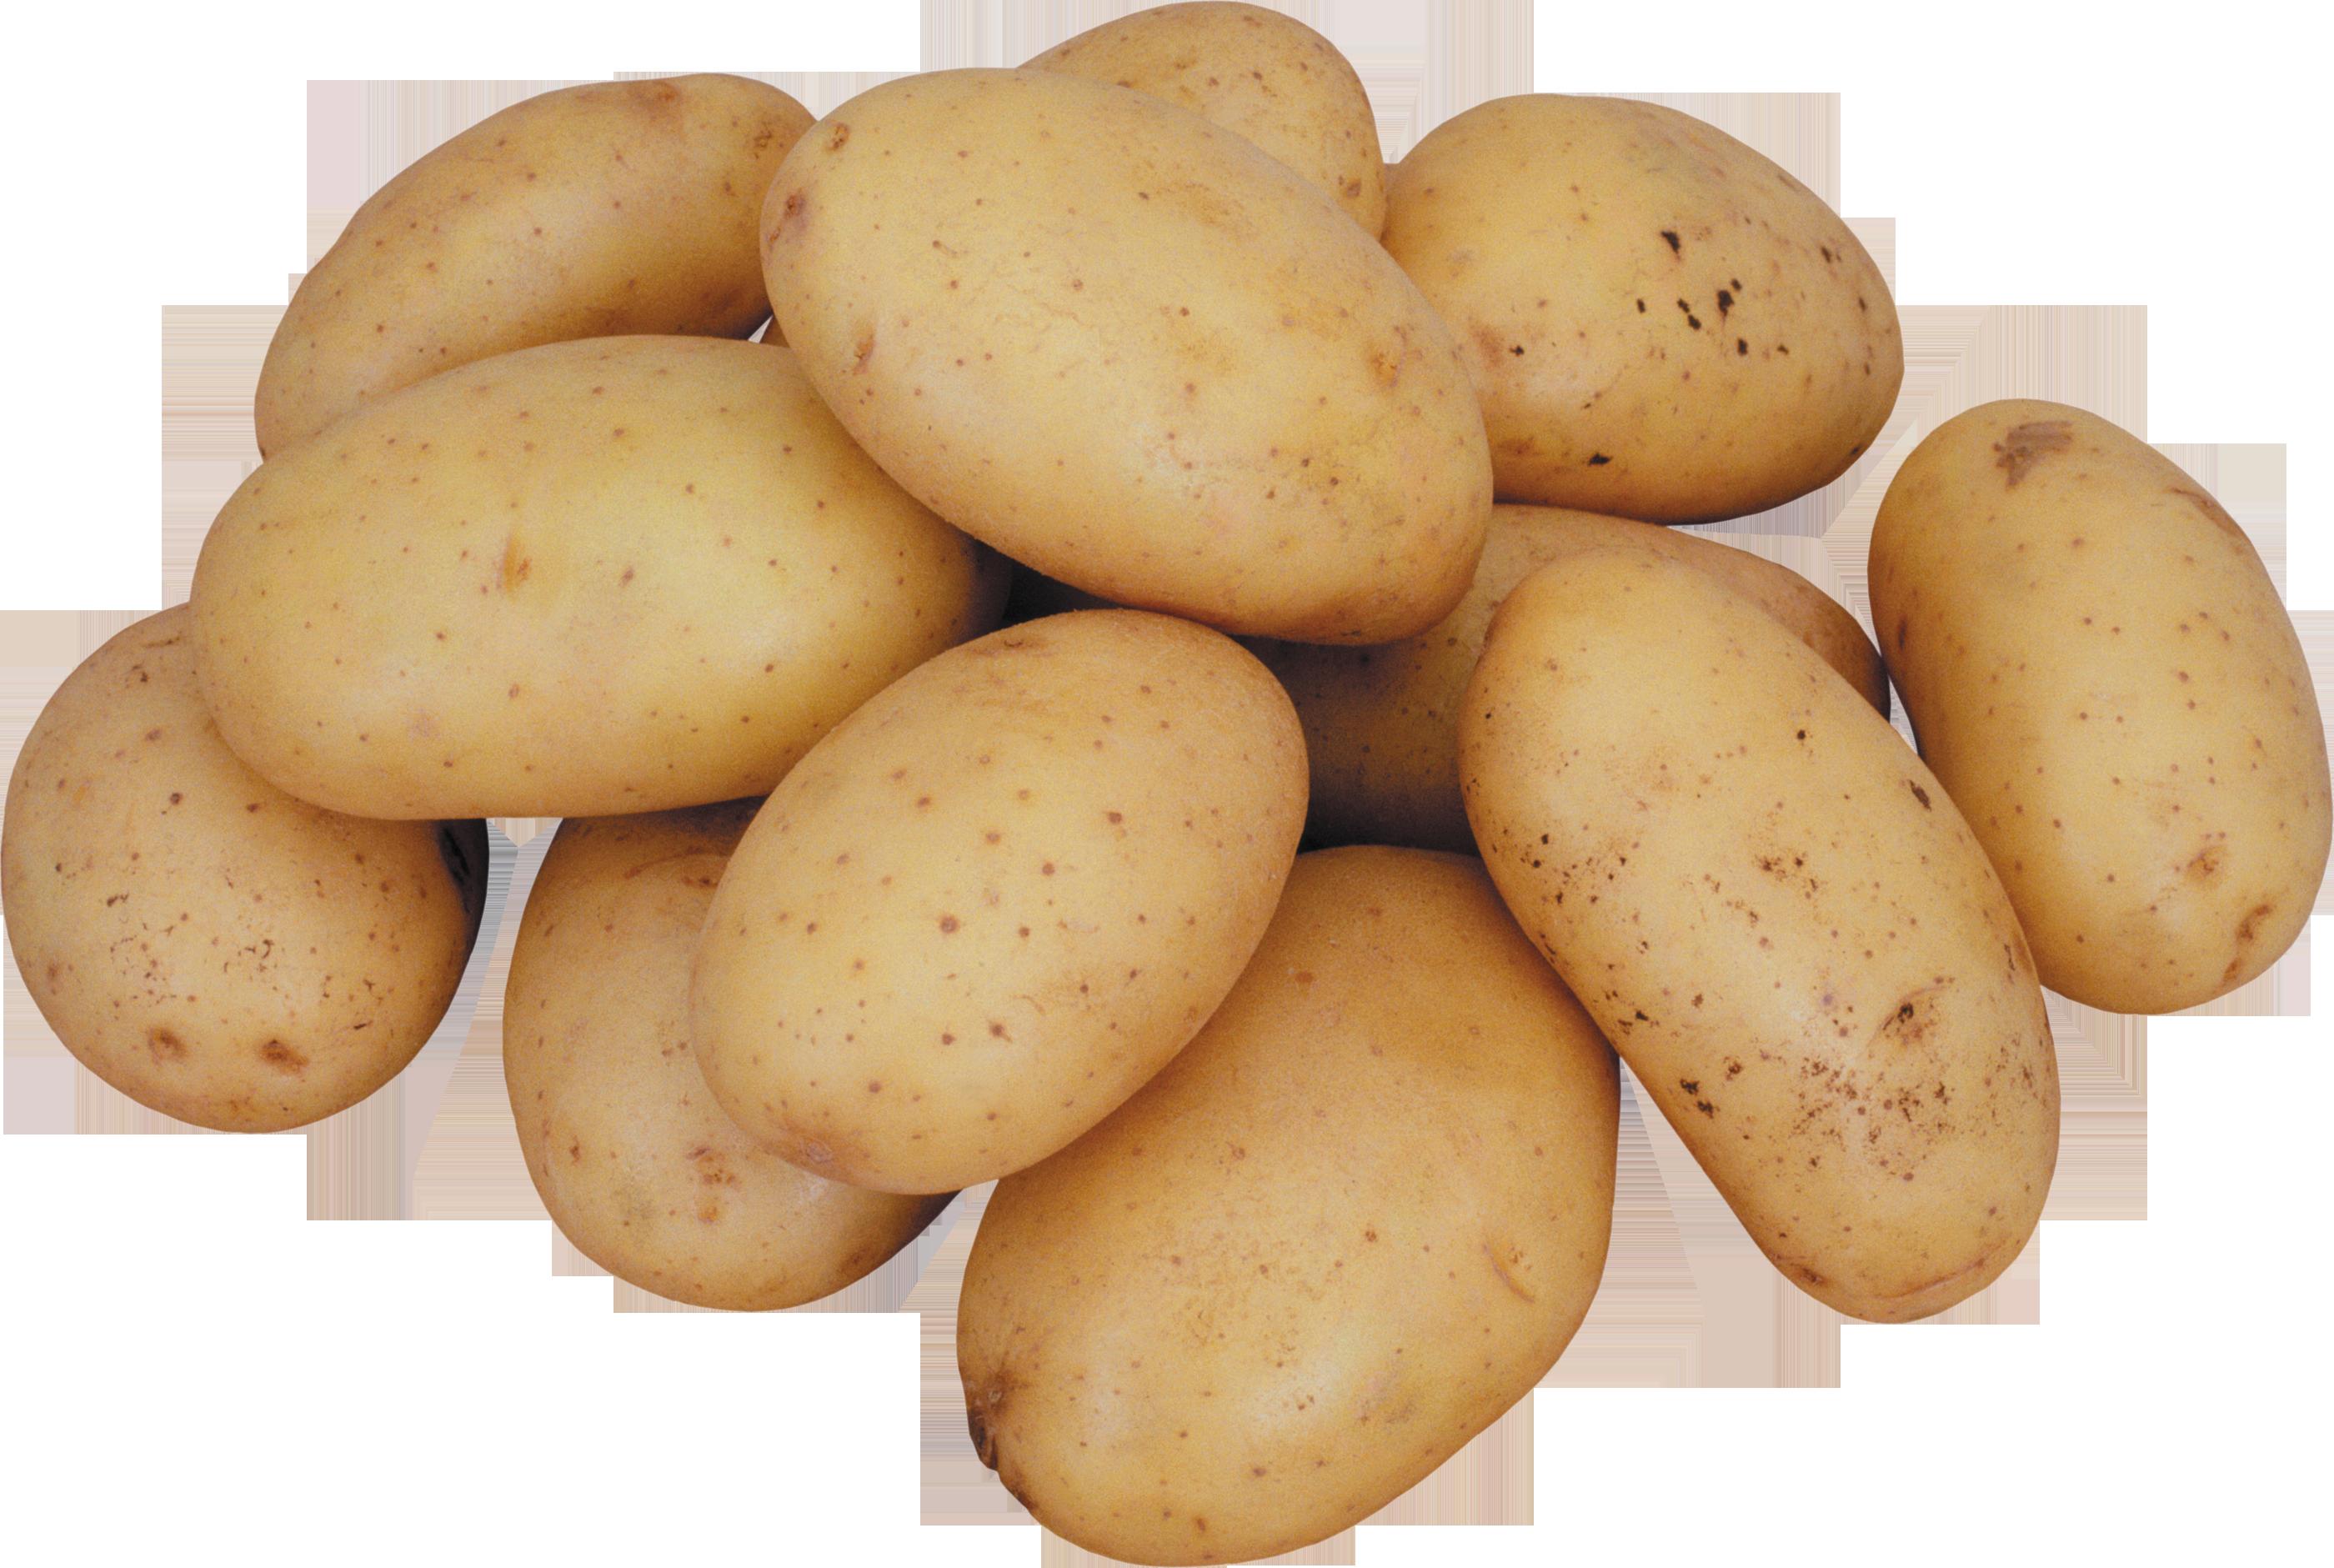 Png image purepng free. Potato clipart potato plant